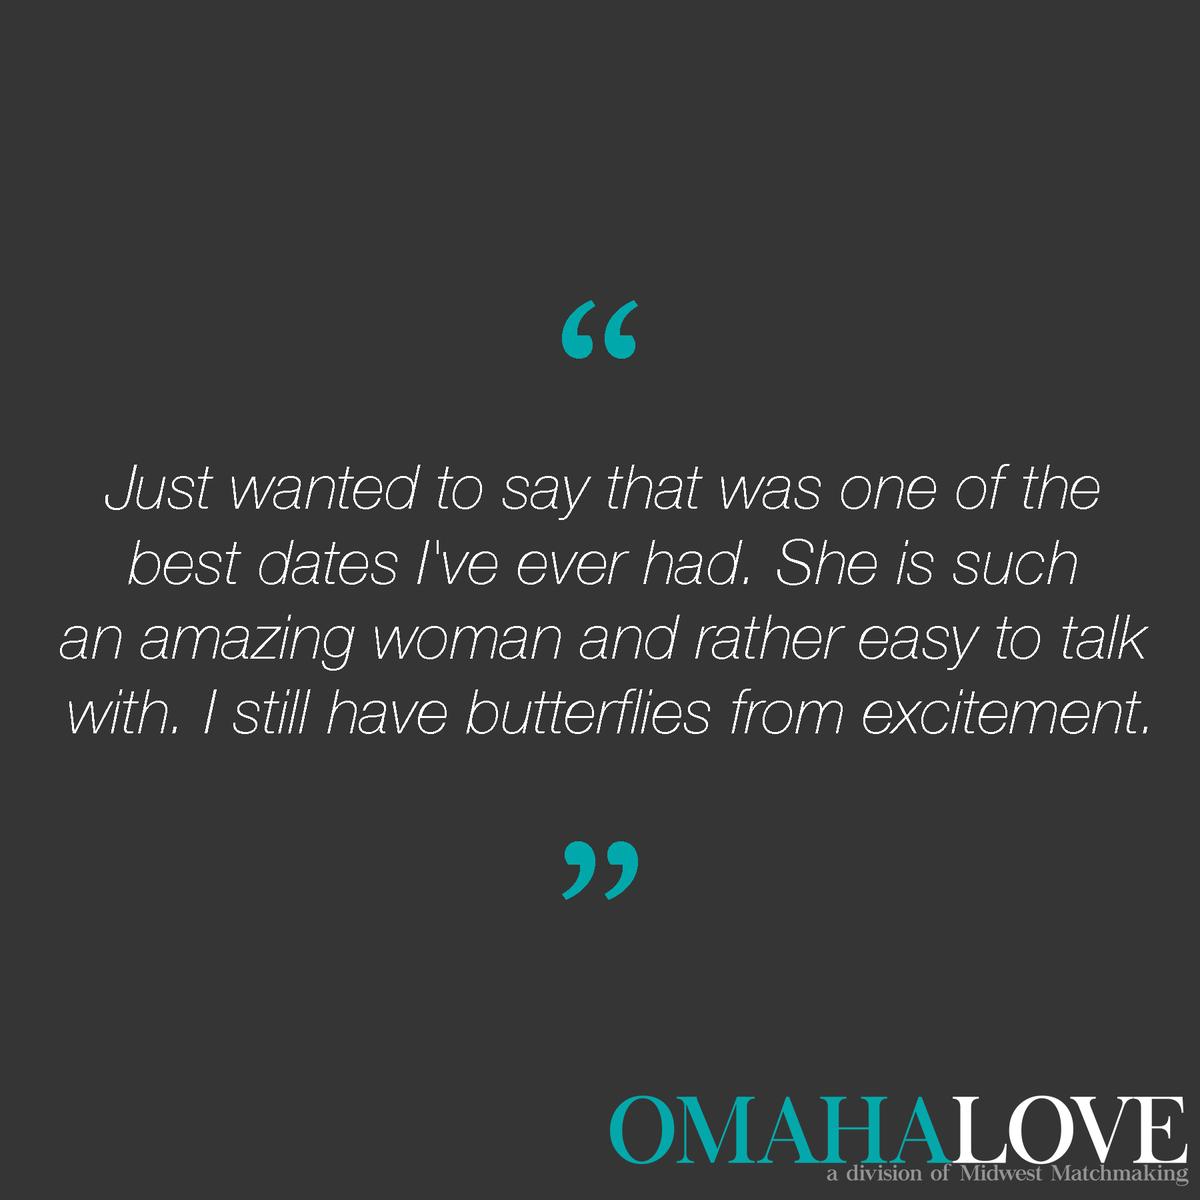 Gratis online dating Omaha Nebraska VIP hastighet dating